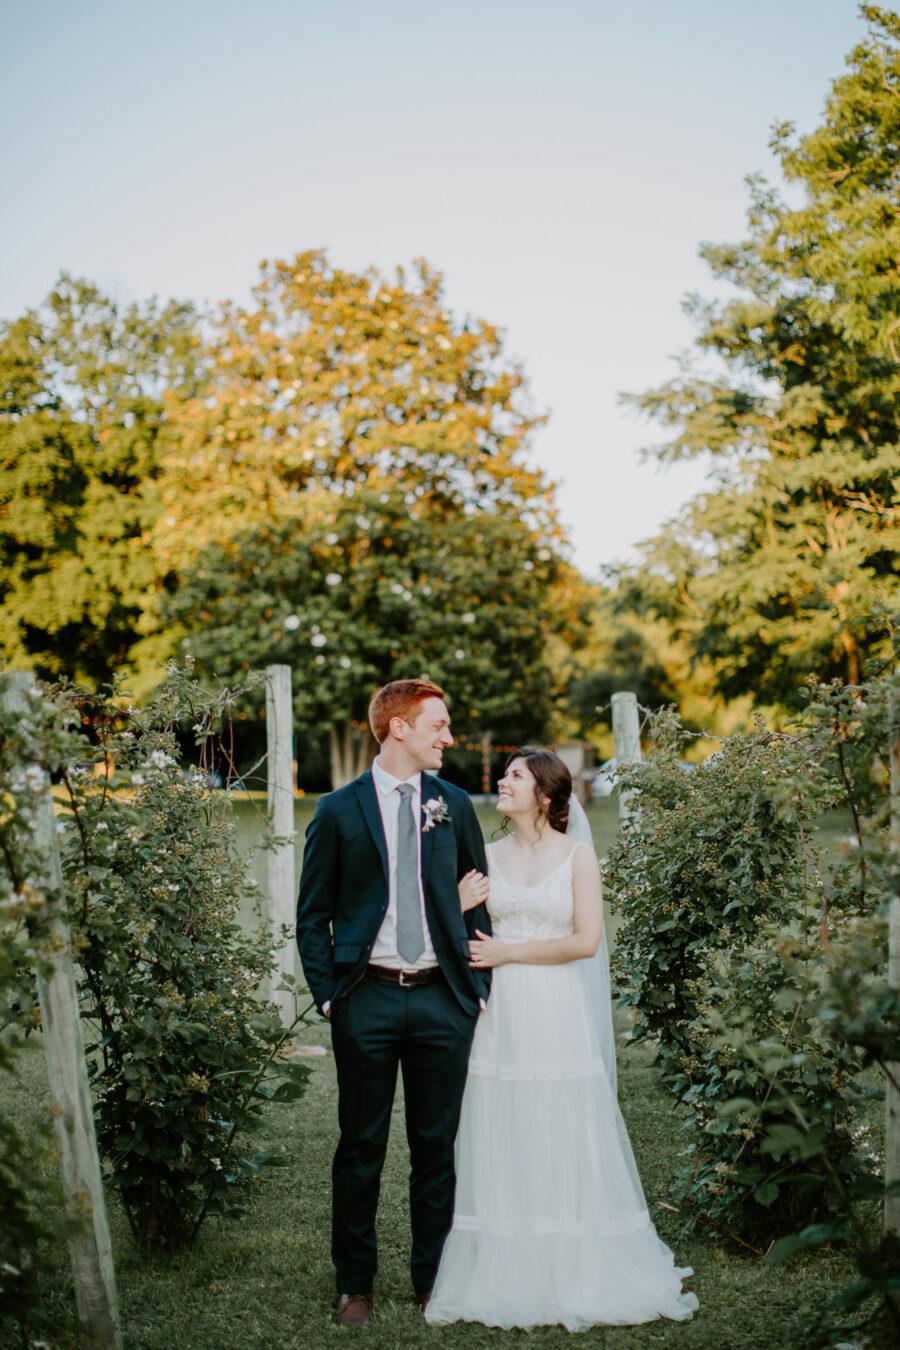 Vibrant Summer Wedding at Sinking Creek Farm featured on Nashville Bride Guide